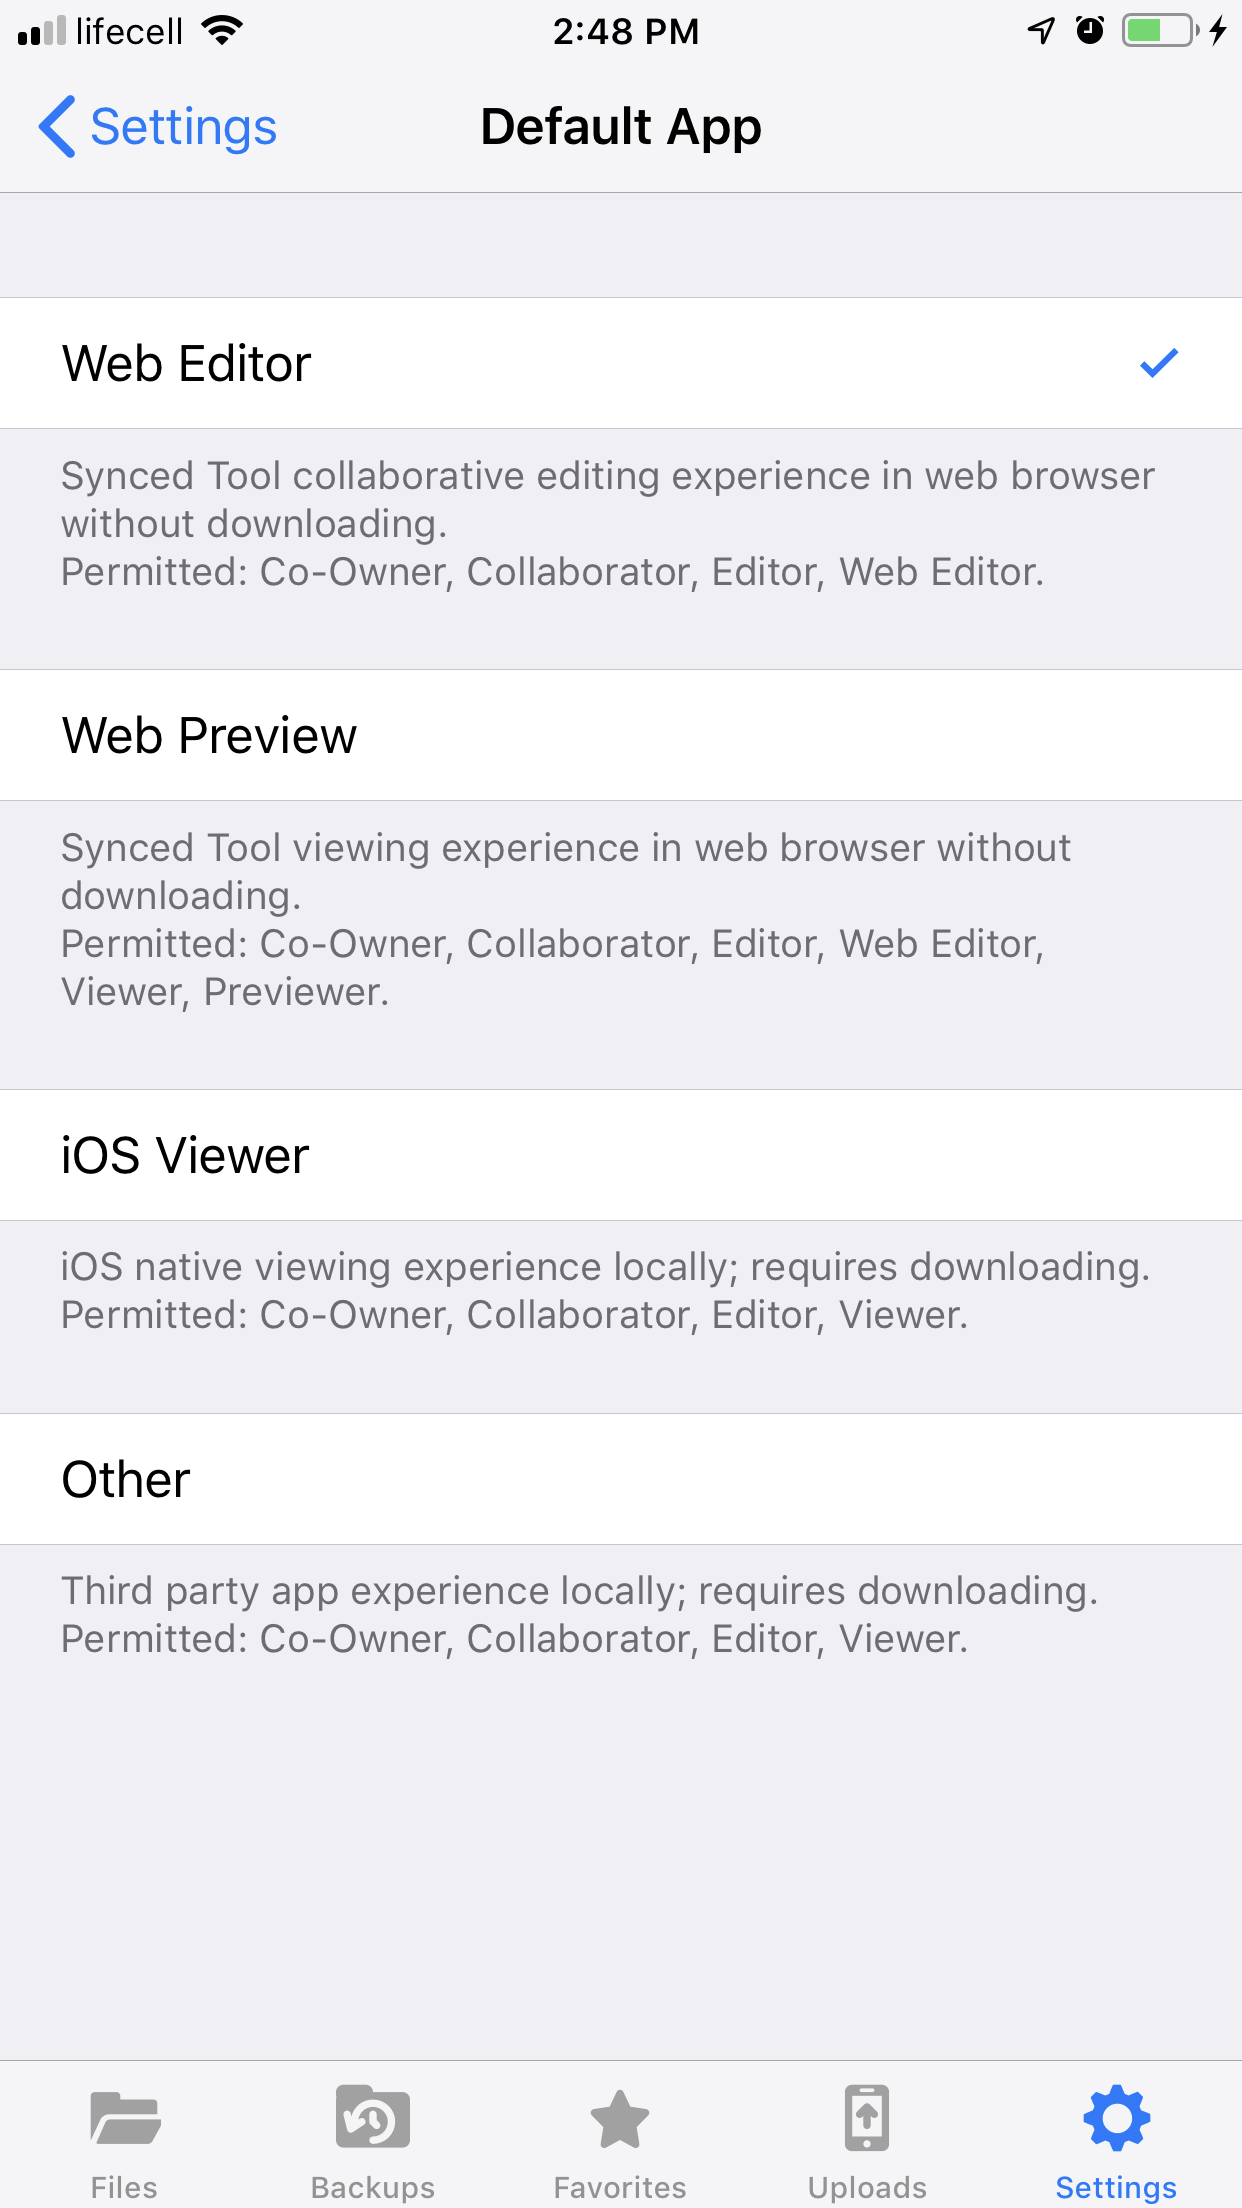 vboxxcloud ios app update - 2